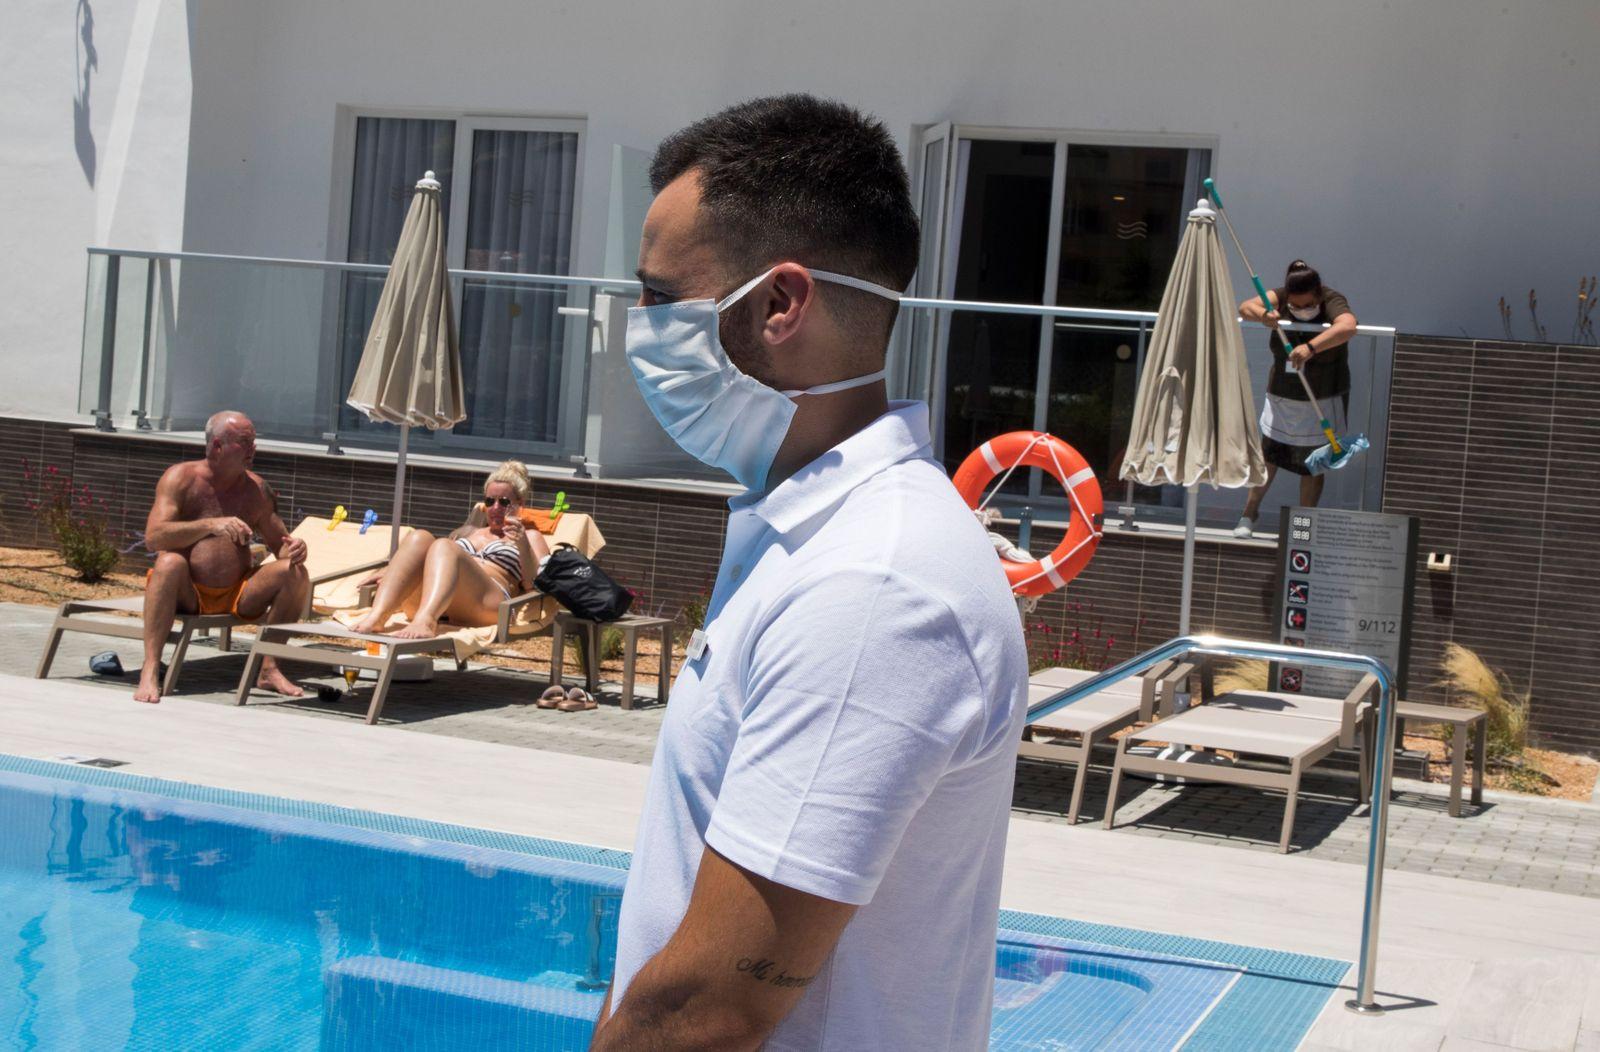 SPAIN-GERMANY-HEALTH-TOURISM